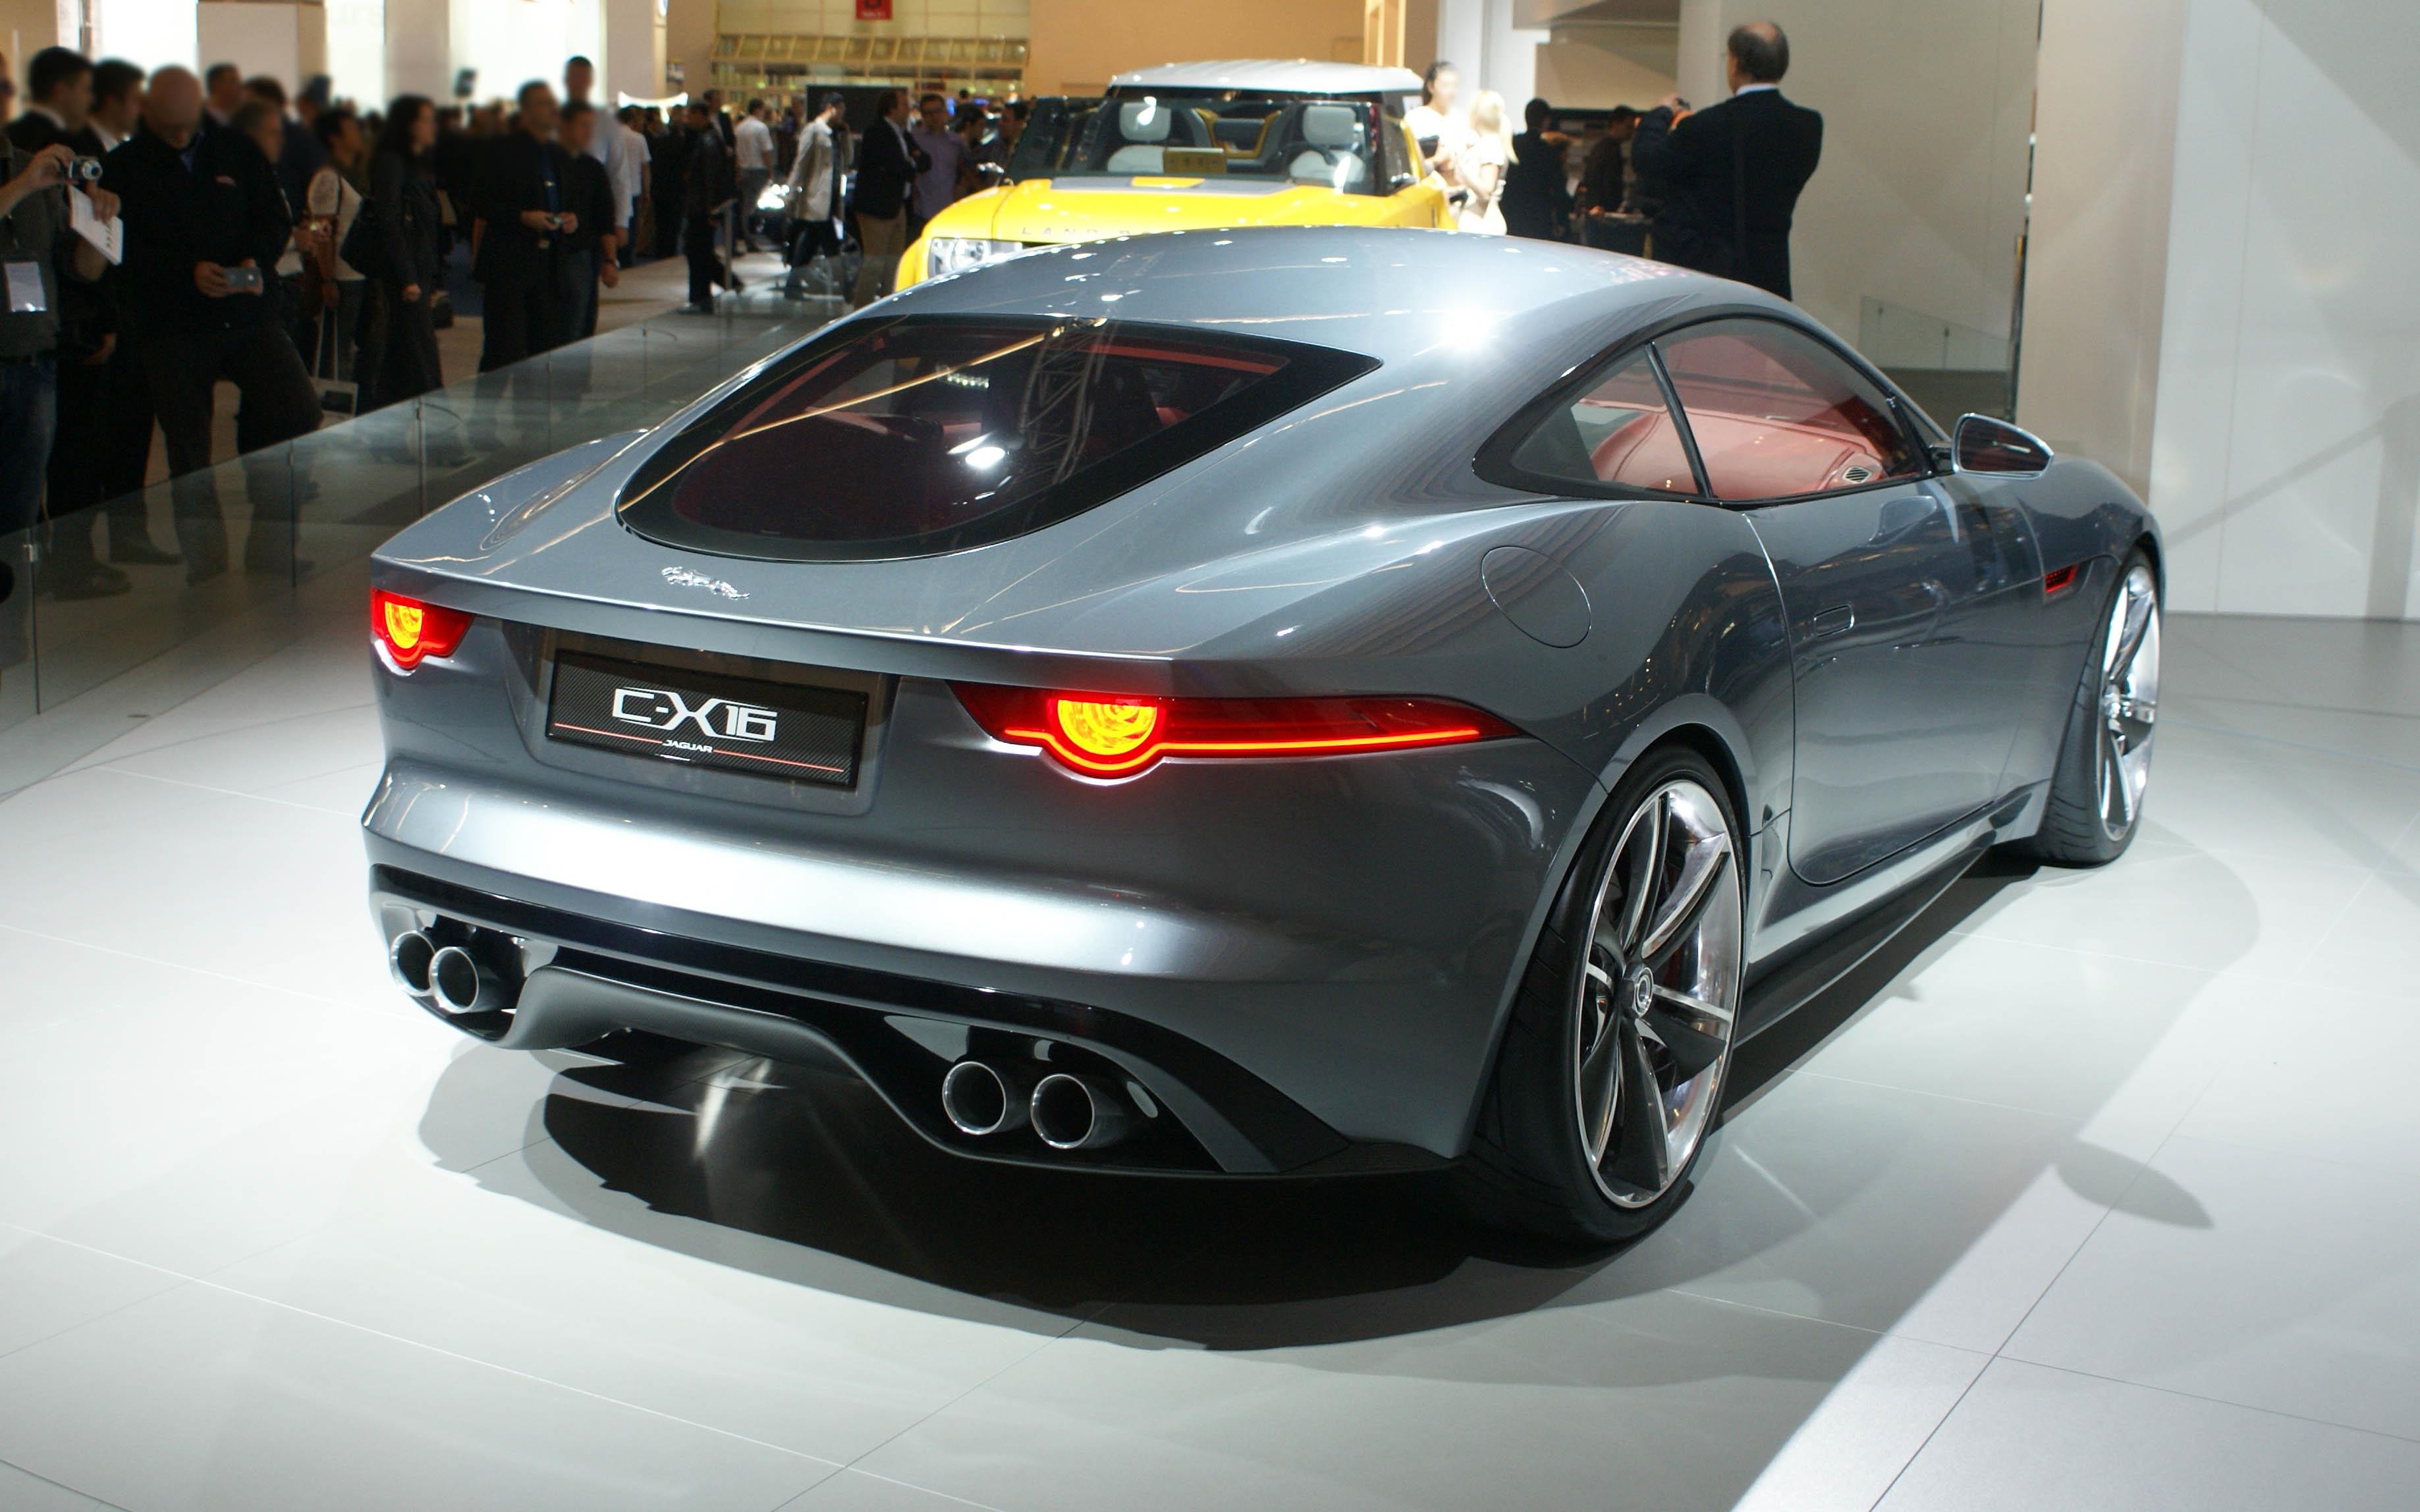 jaguar c x16 deskto